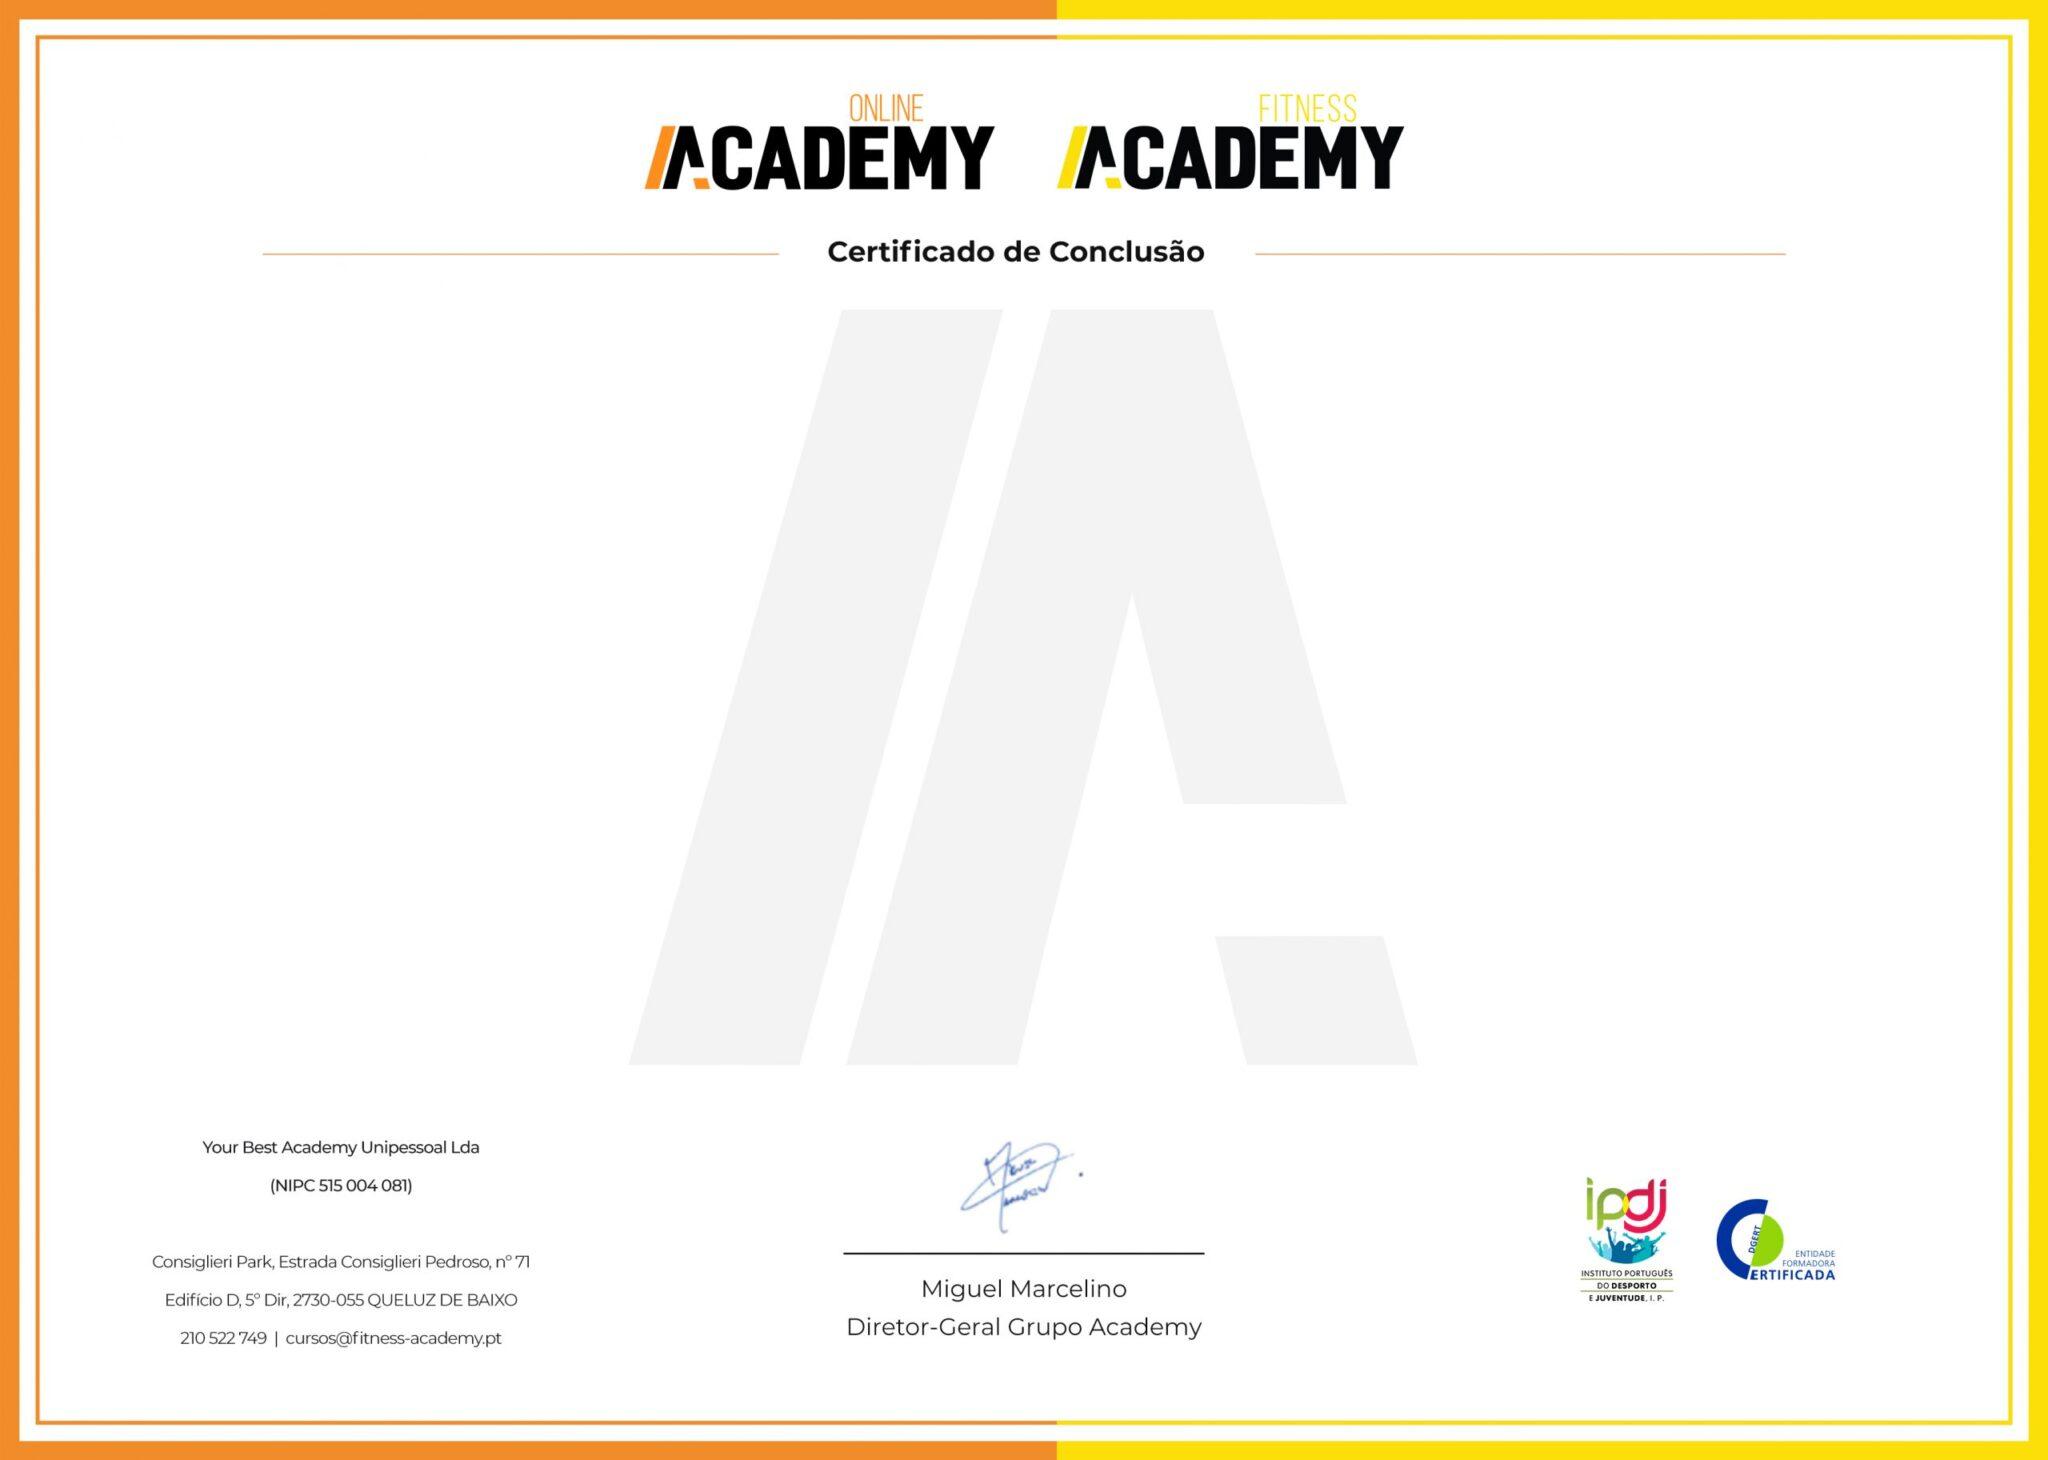 Visual Certificado Online Academy Fitness Academy scaled